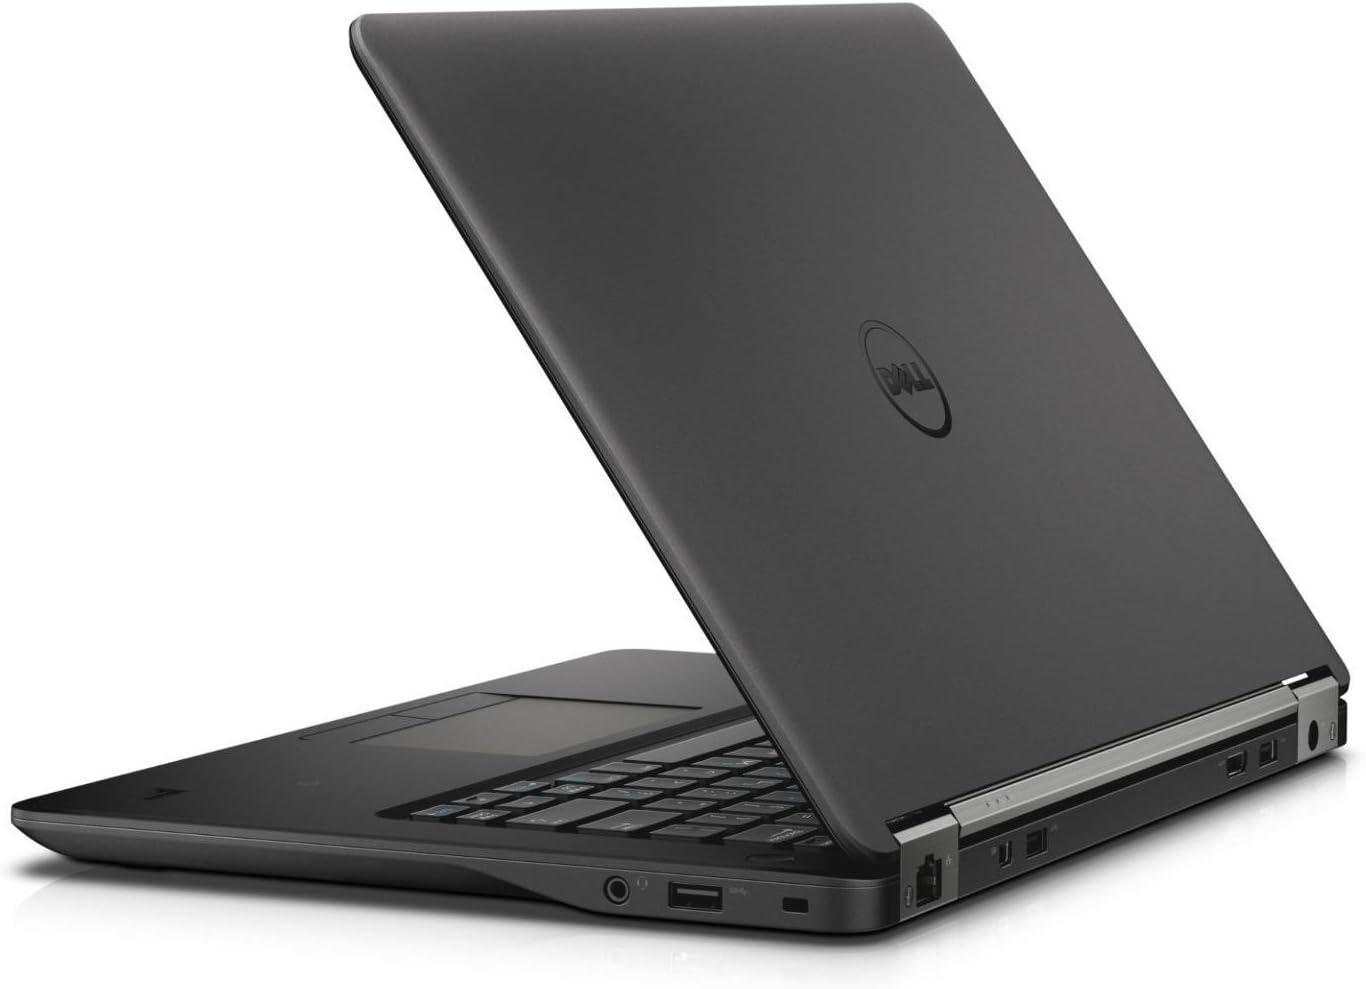 "Dell Latitude E7270 Intel Core i5-6300U X2 2.4GHz 8GB 180GB SSD 12.5"",Black(Certified Refurbished)"